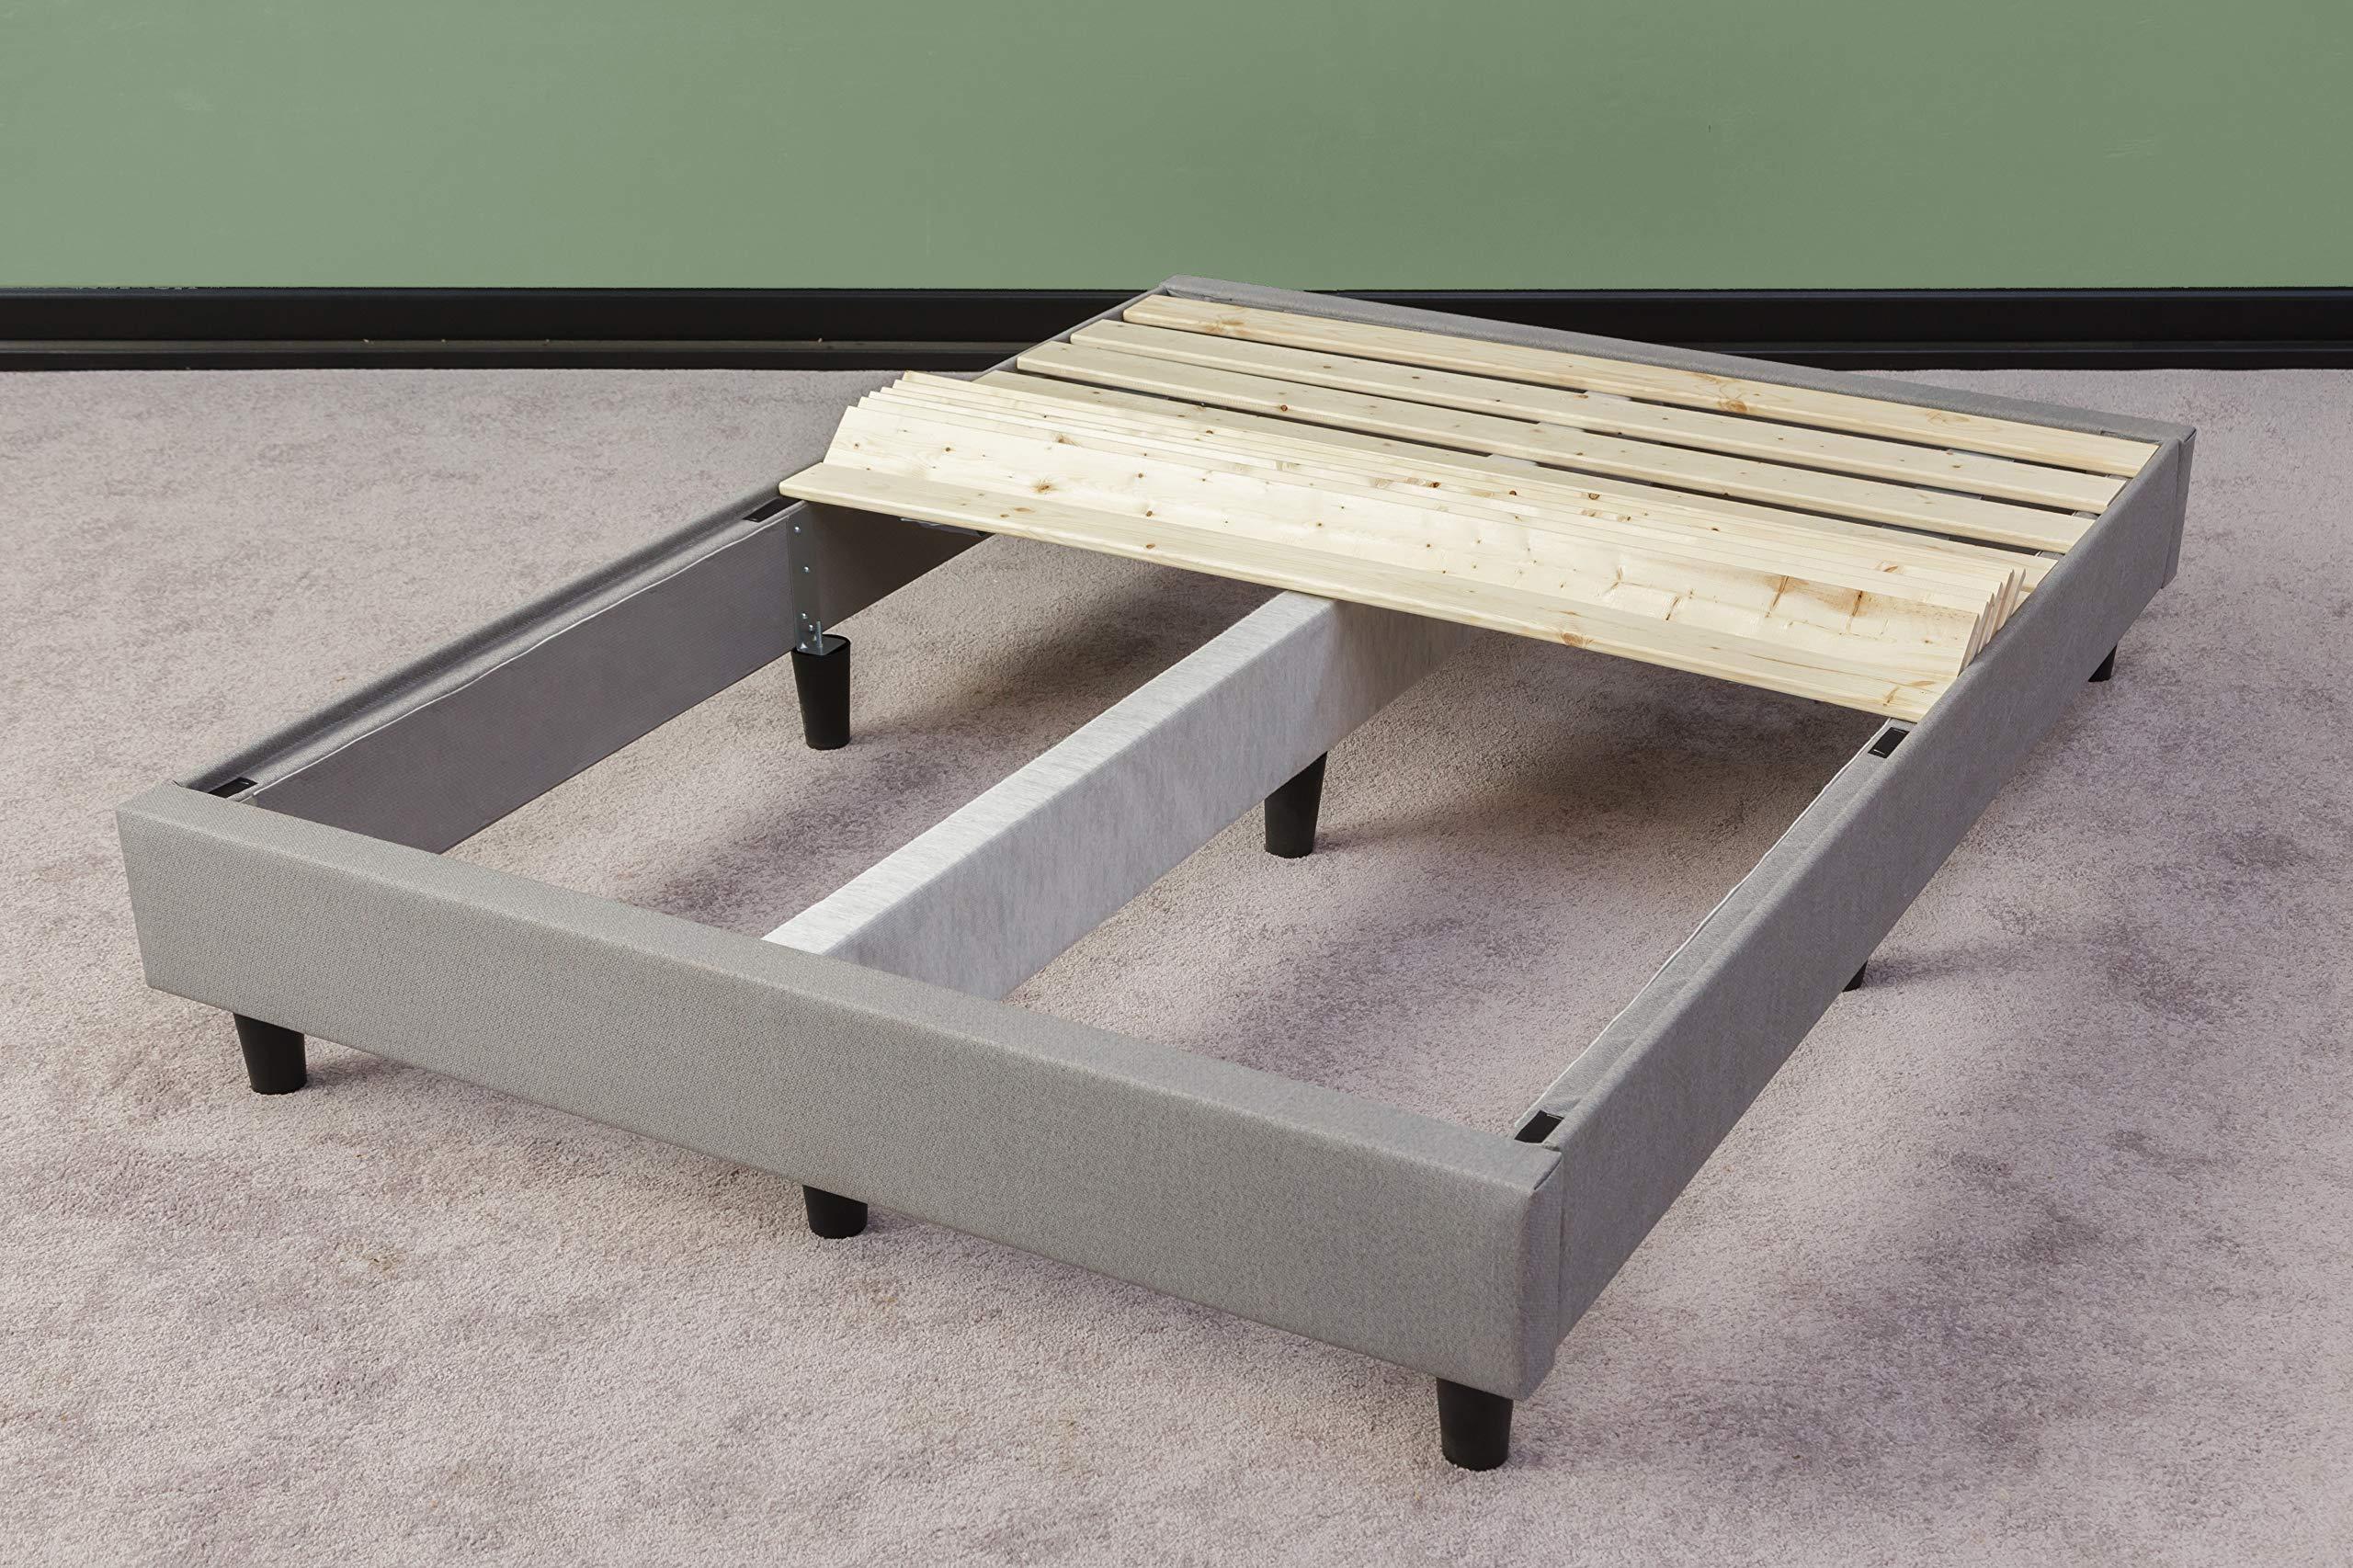 Spring Solution, 1.5-inch Heavy Duty Mattress Support Wooden Bunkie Board / Slats, QueenSize